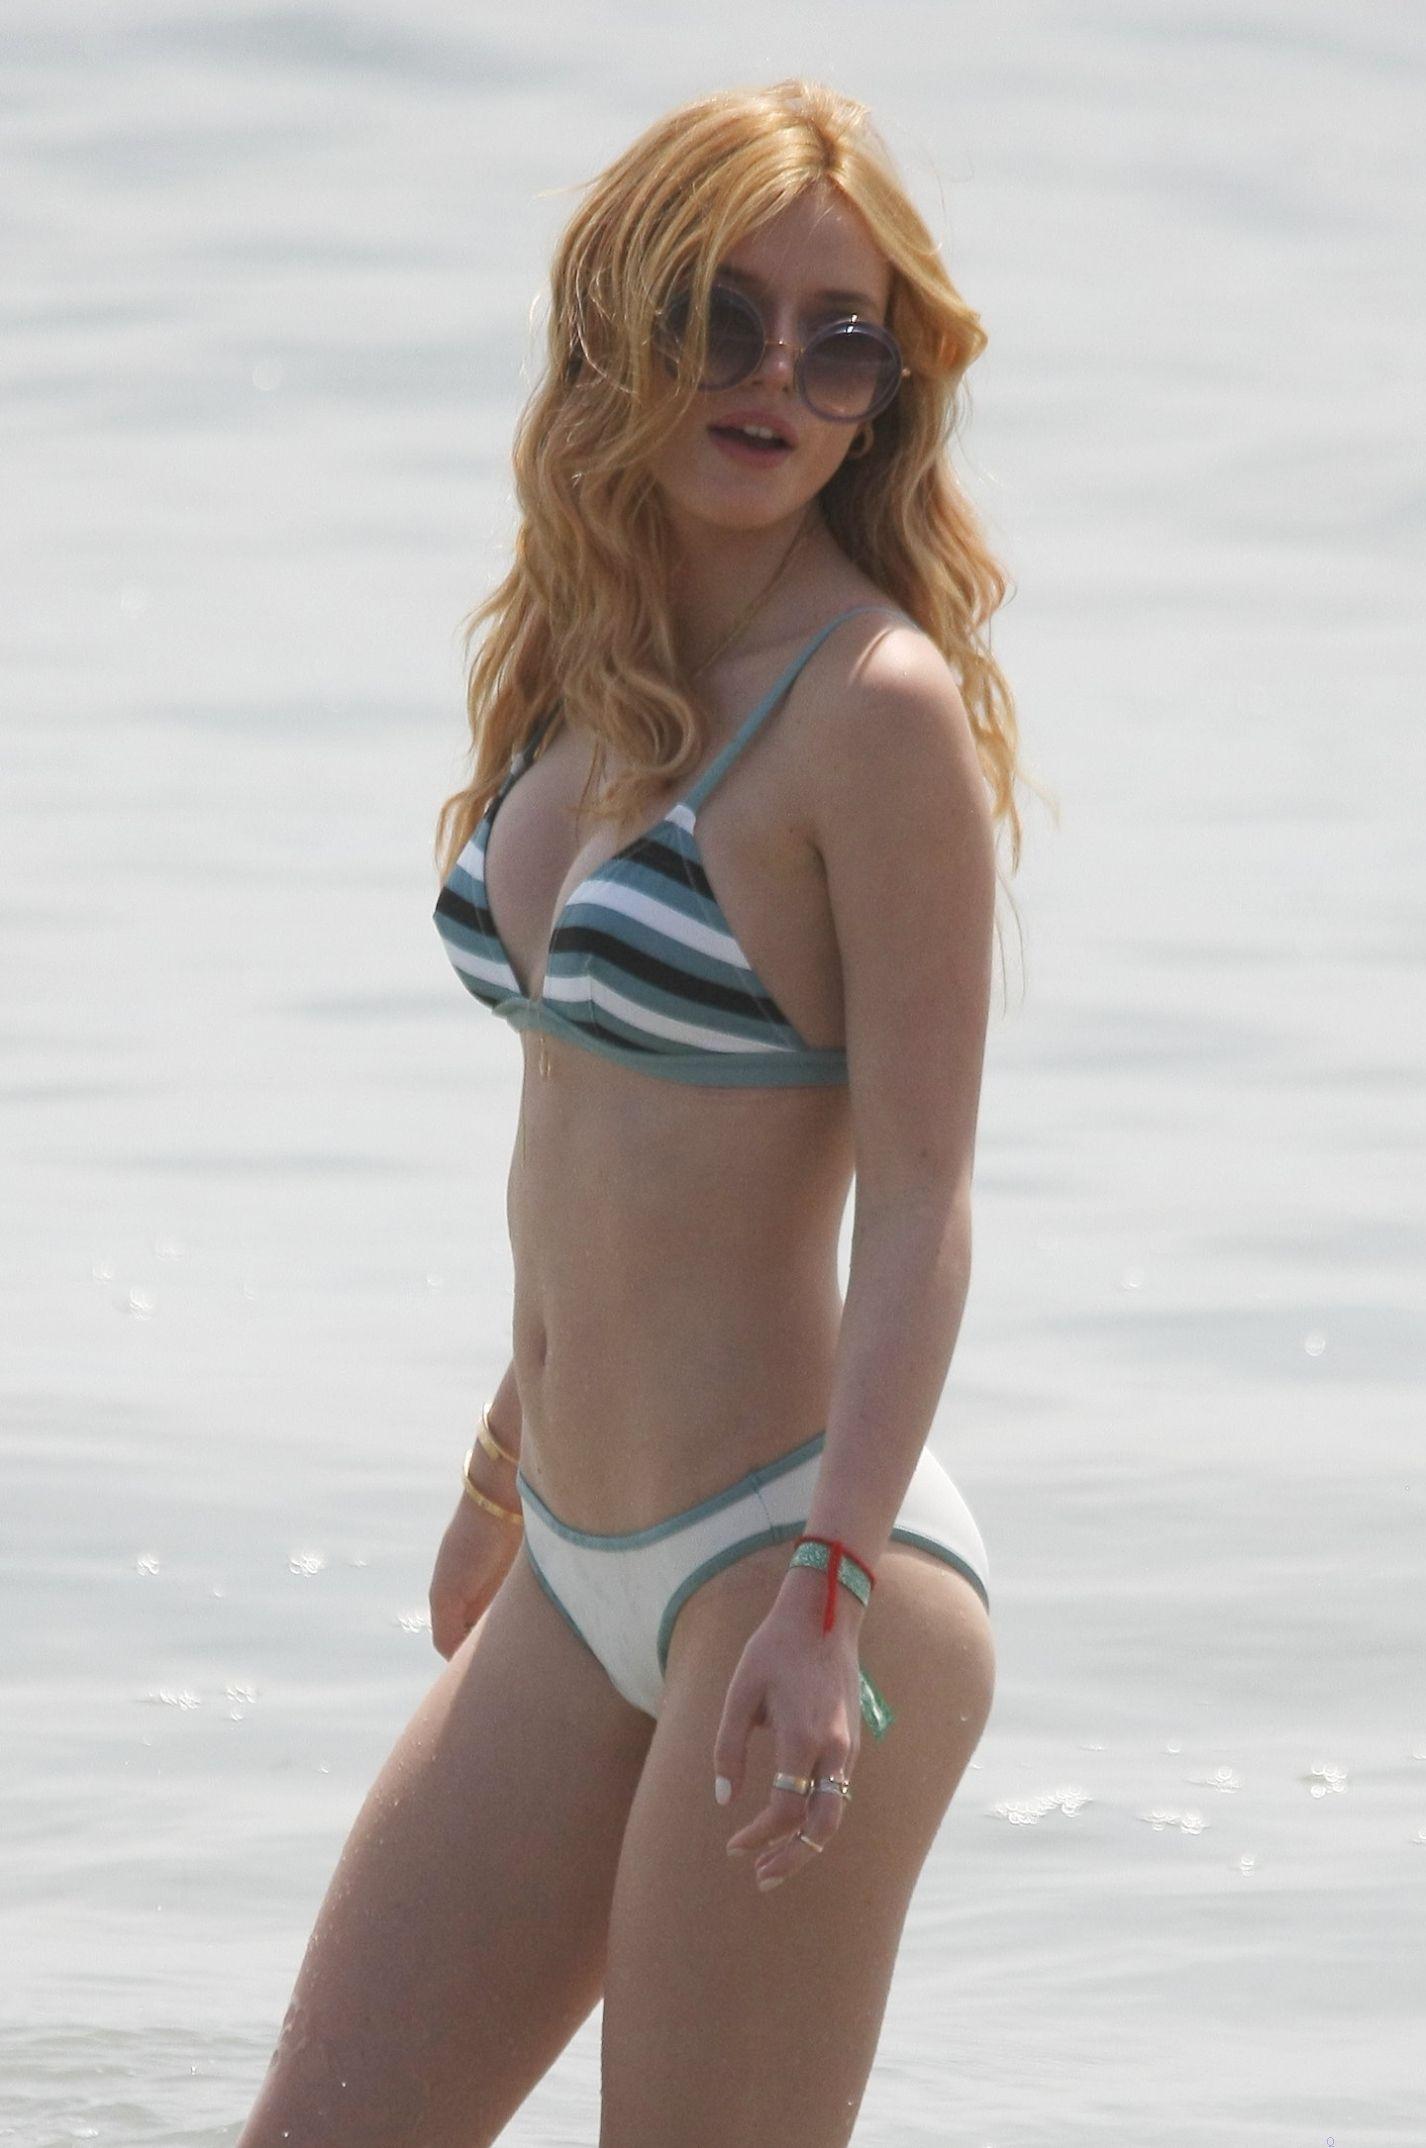 underwear Bikini Bella Avery Thorne naked photo 2017